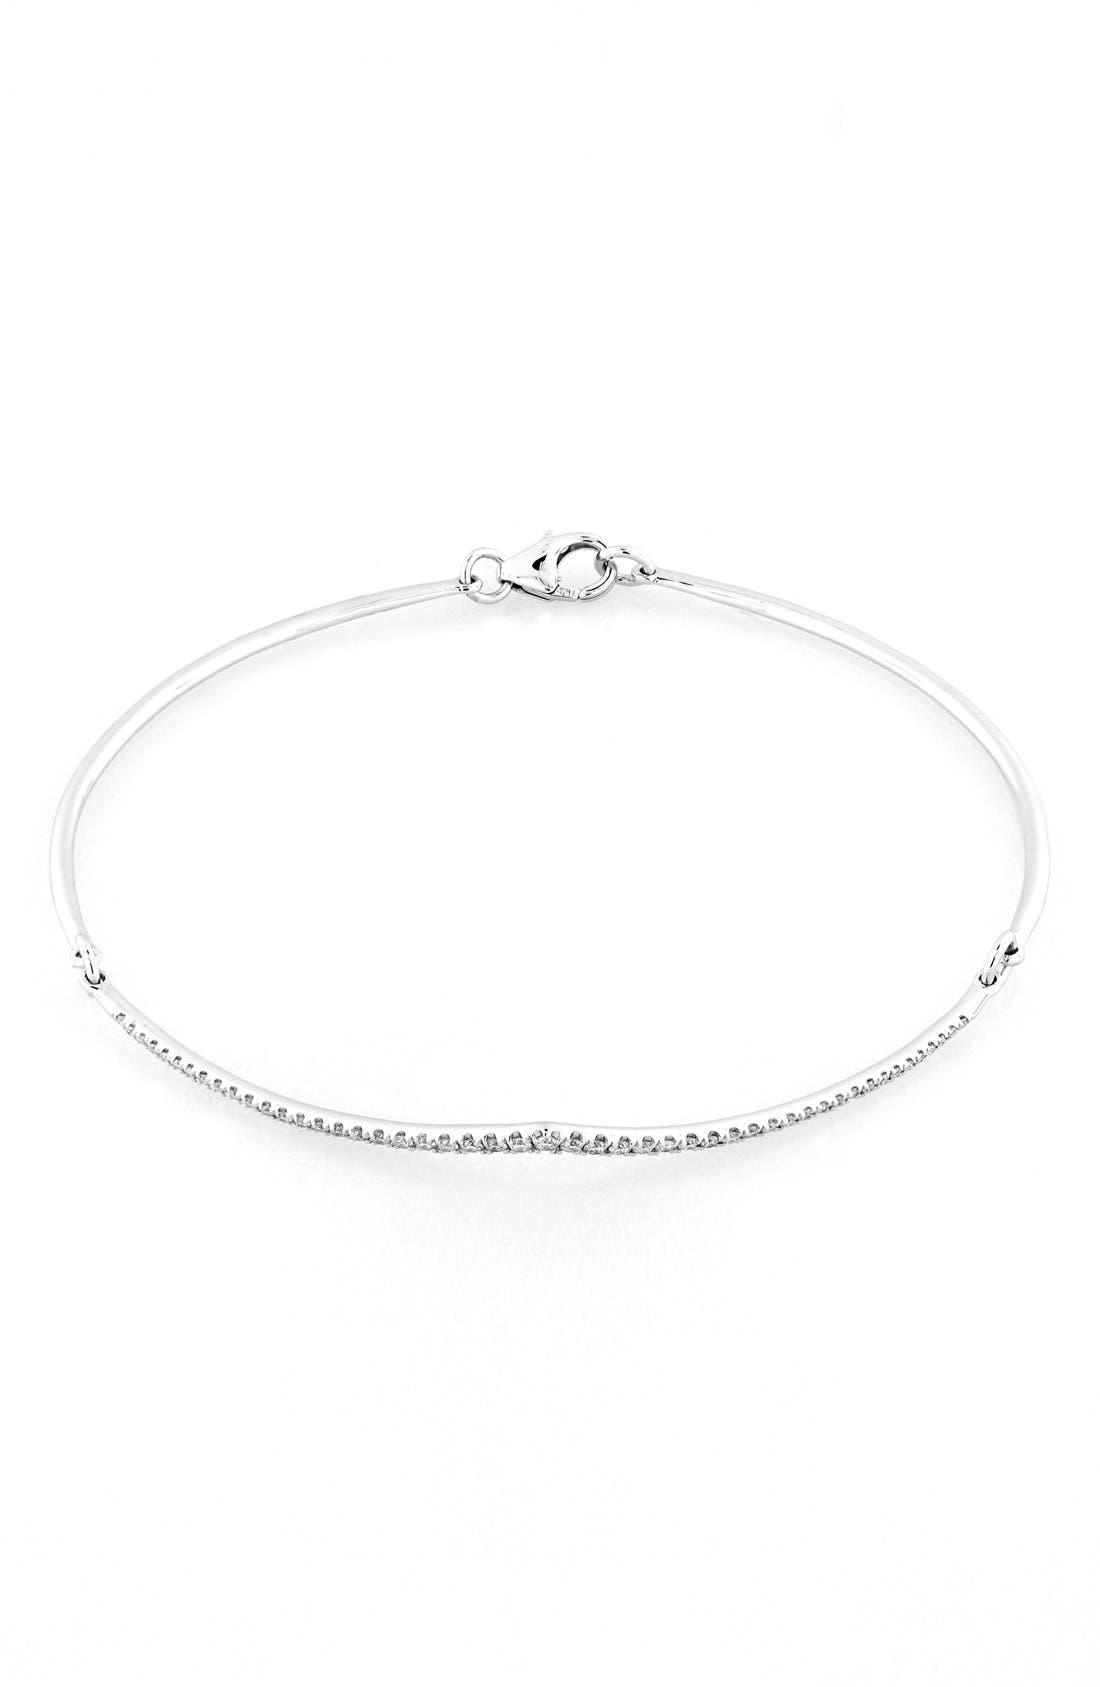 Pavé Diamond Bangle Bracelet,                             Alternate thumbnail 2, color,                             White Gold